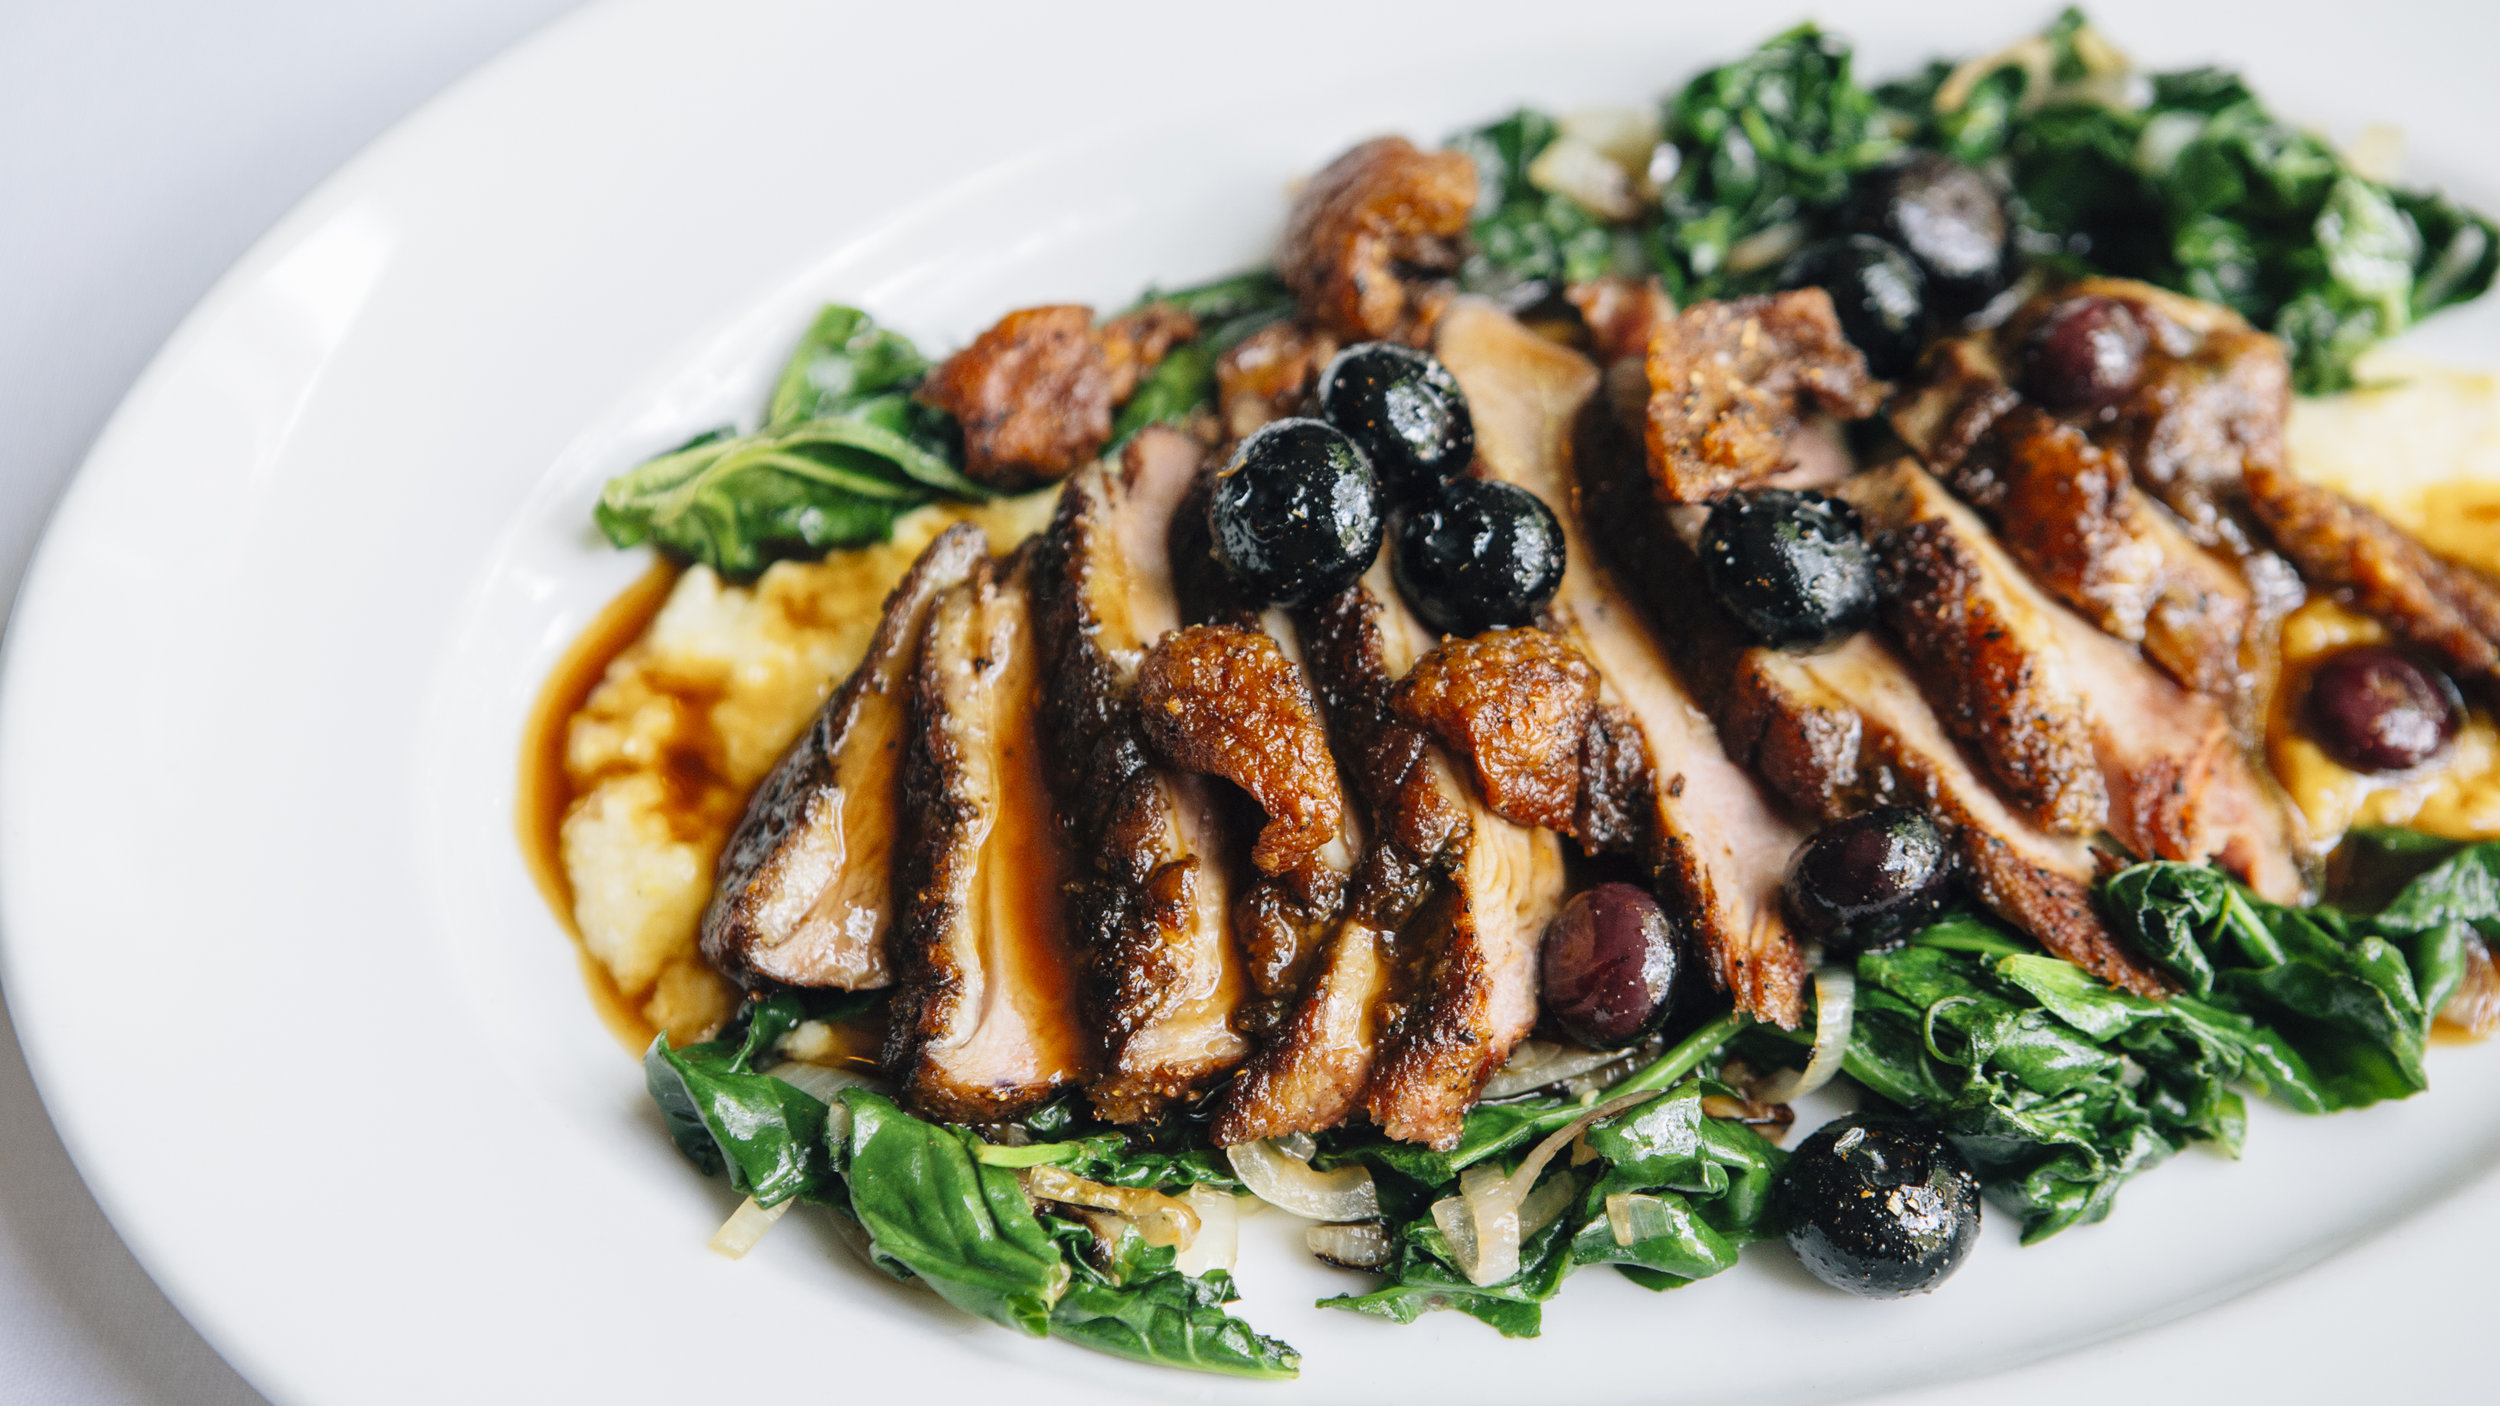 GK_Carnivorous_309-Birmingham-Chef-Frank-Stitt-Grilled-Duck-Breast-Highlands-Bar-and-Grill-16x9-H.jpg